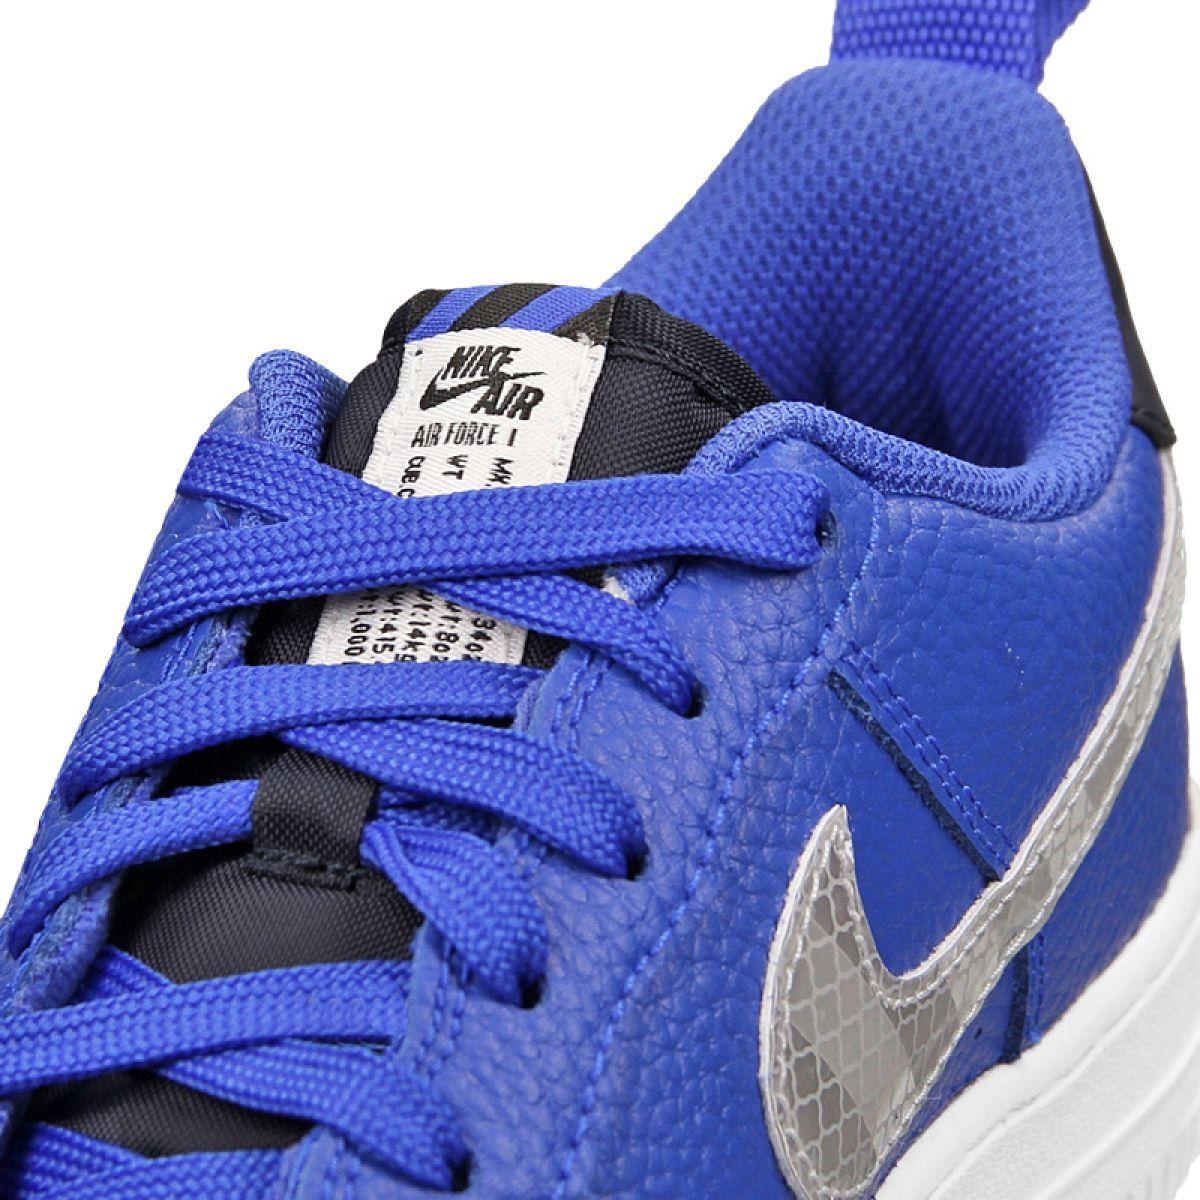 Sports Men S Nike Nike Air Force 1 Lv8 2 Gs Jr Bq5484 400 Shoes Blue Nike Air Force Nike Air Mens Nike Shoes